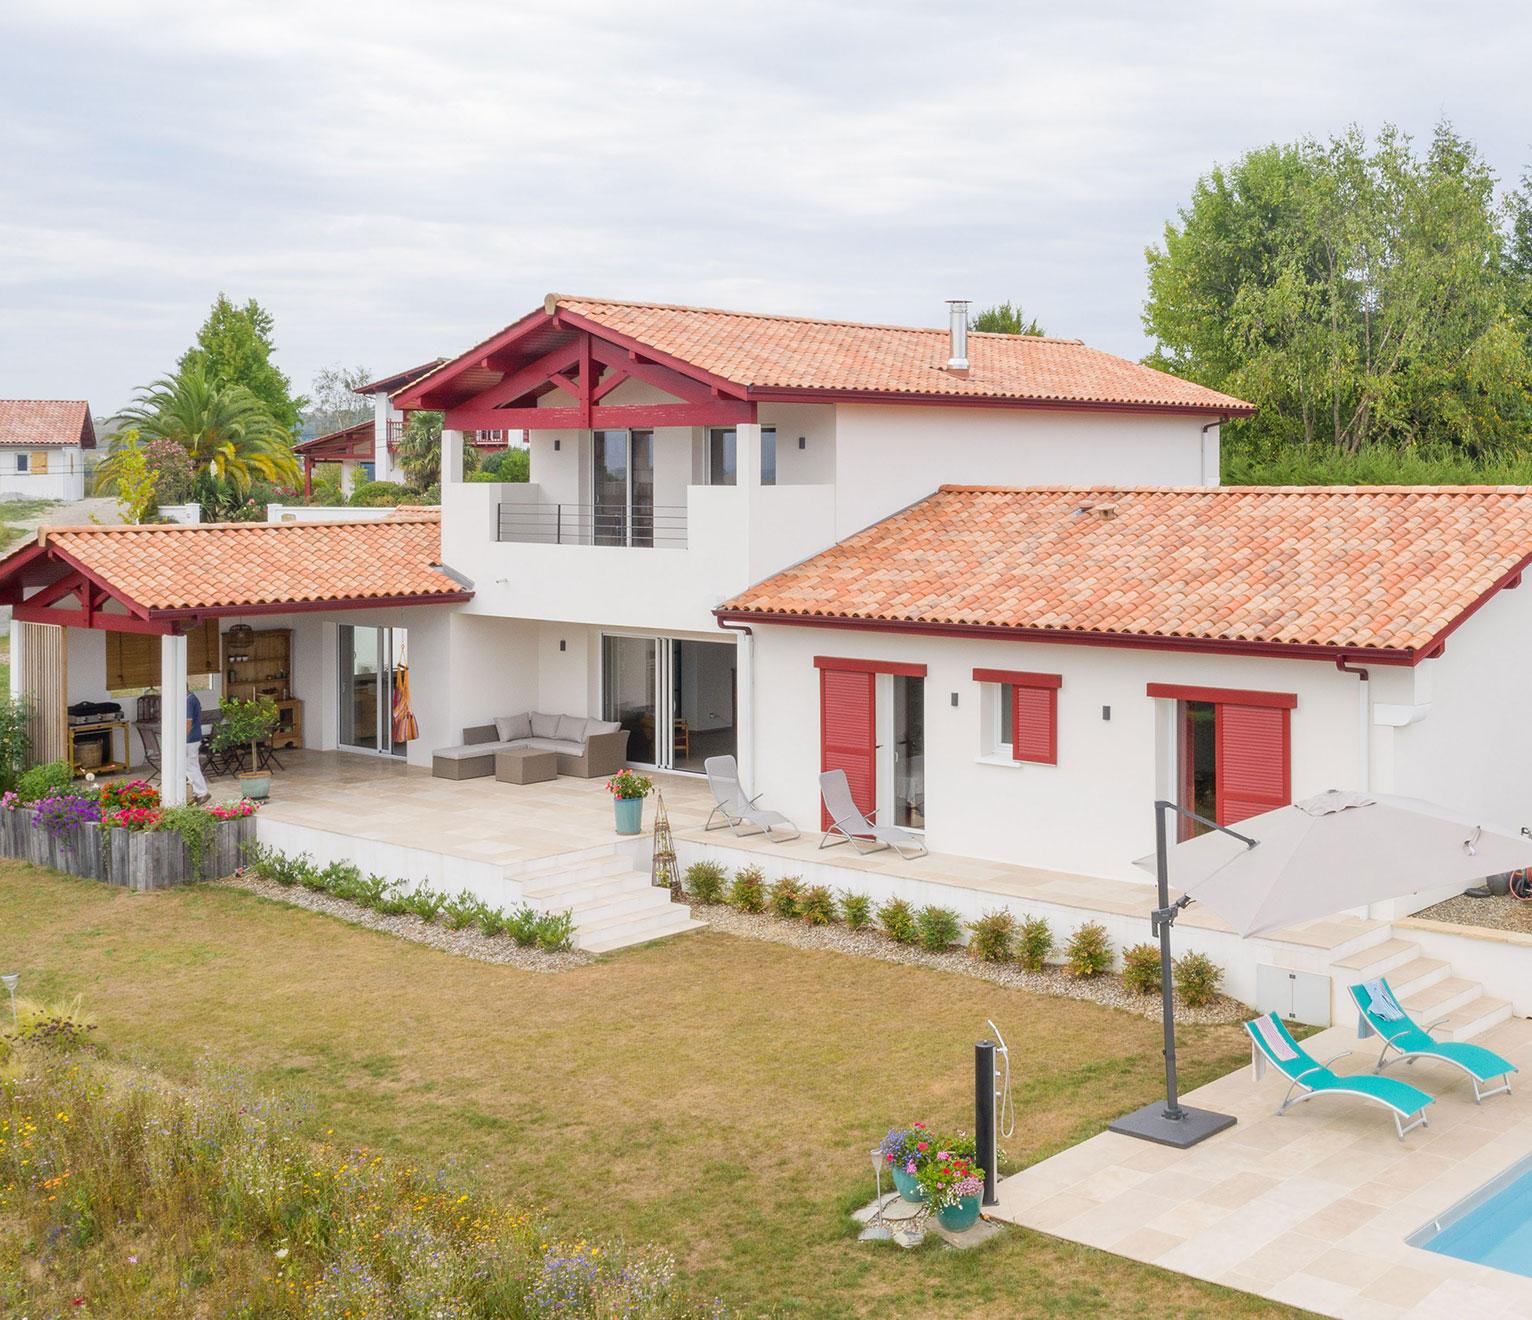 une grande maison basque avec piscine